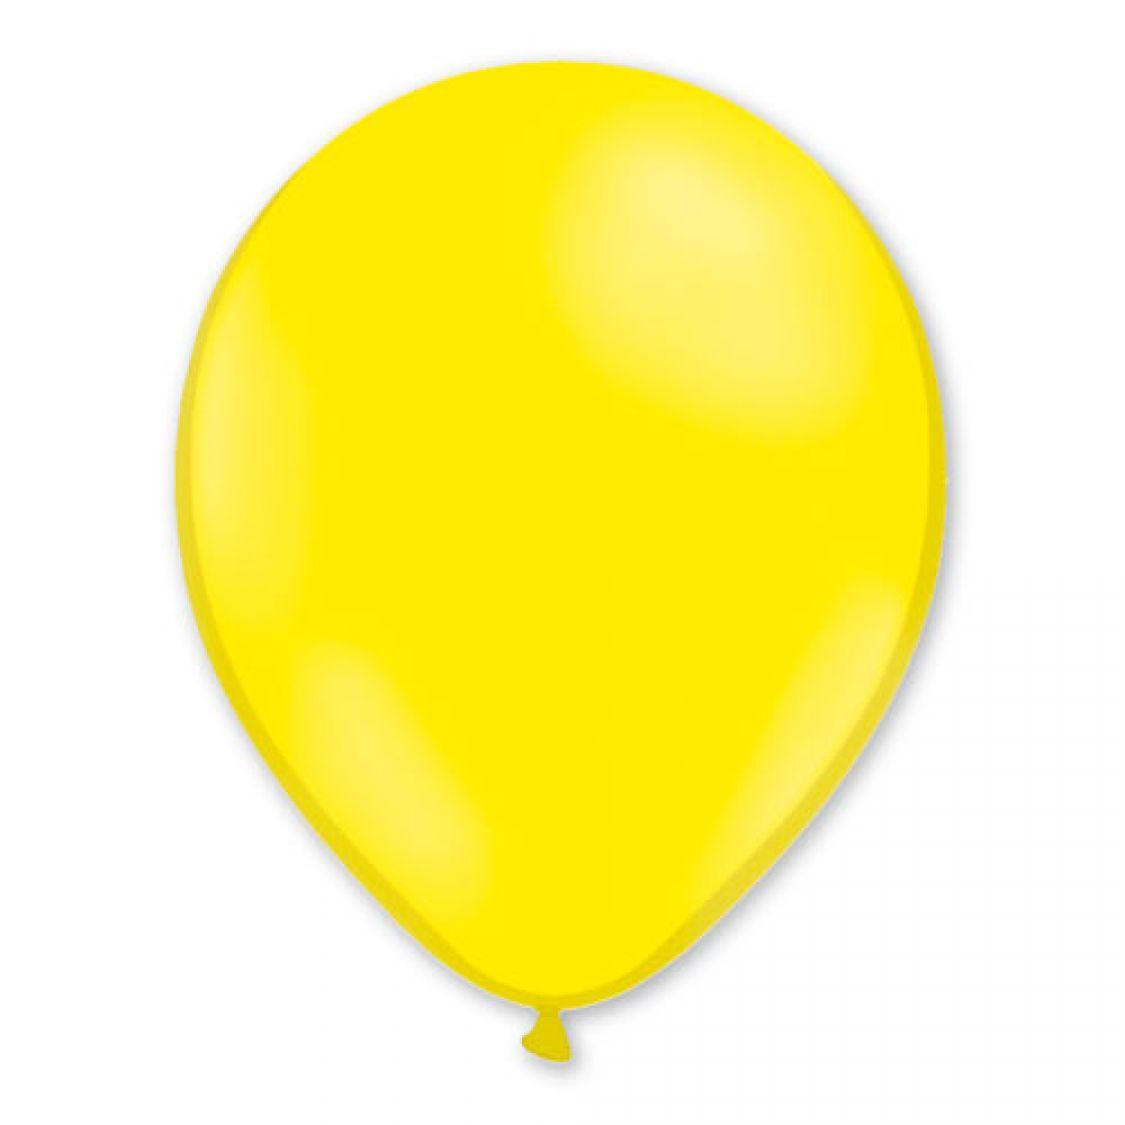 Ballon Jaune Citron